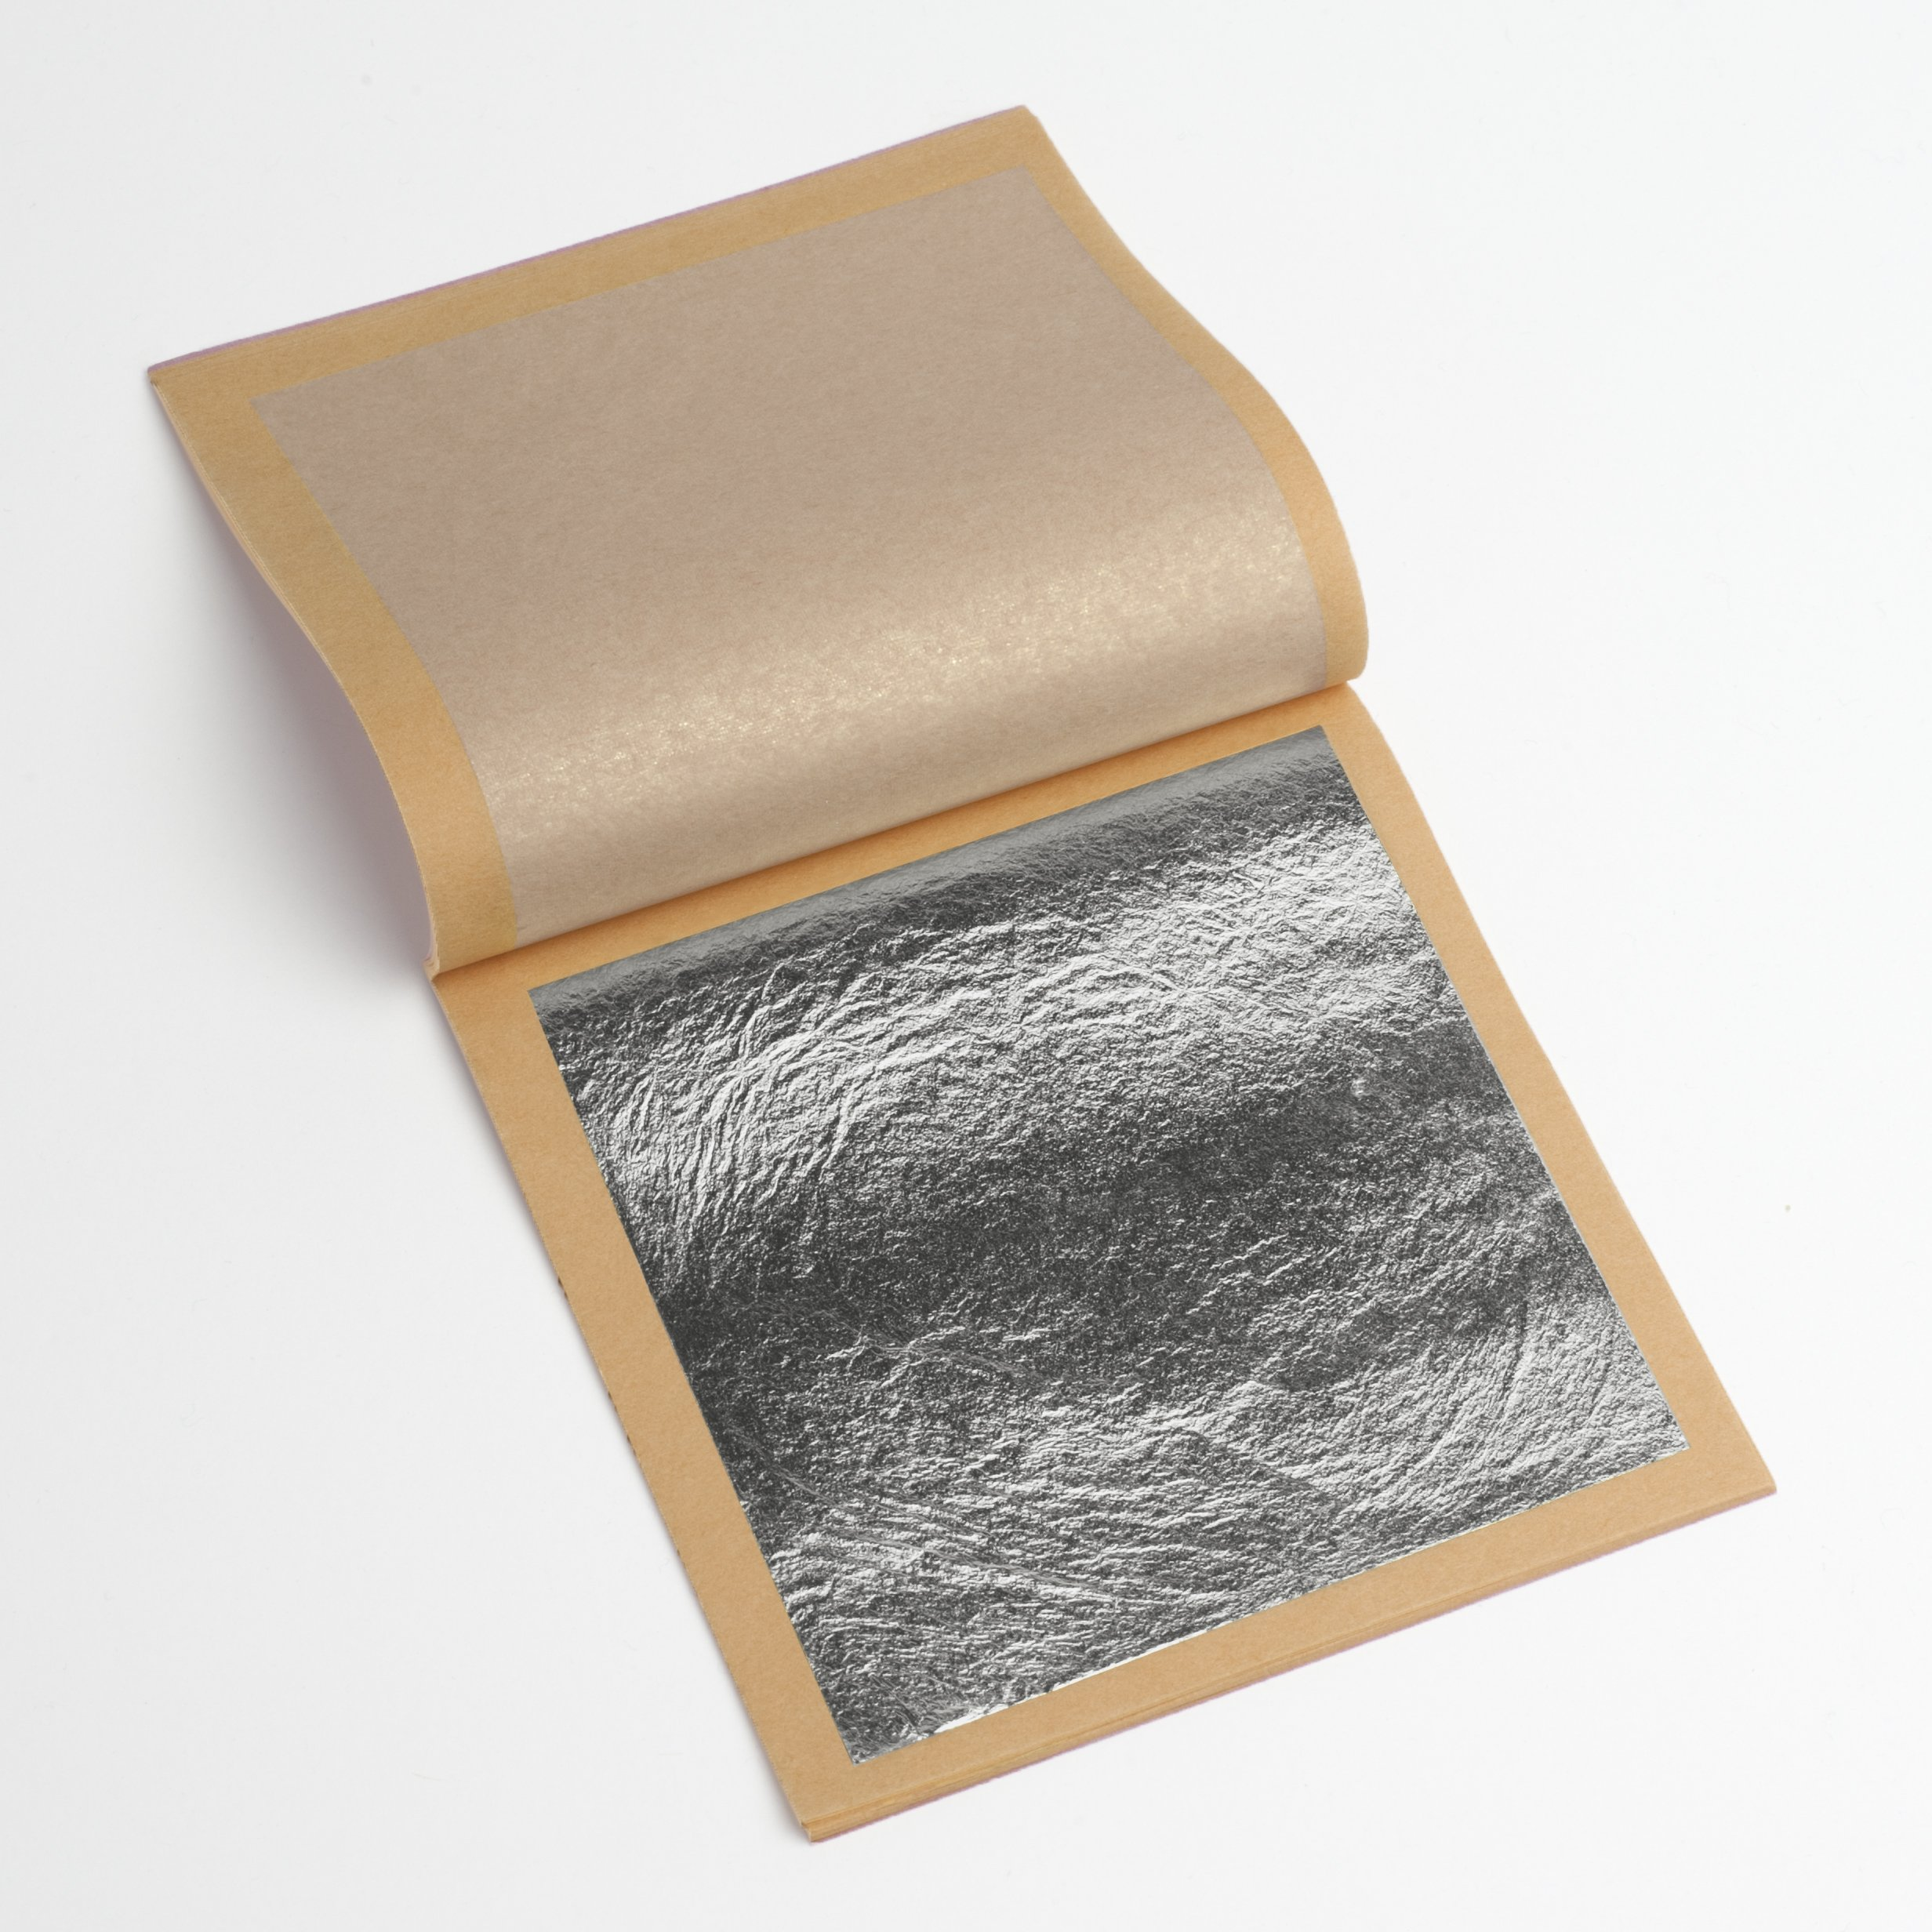 Genuine Silver Leaf (Loose & Transfer) (20 booklets (500 sheets), Loose)